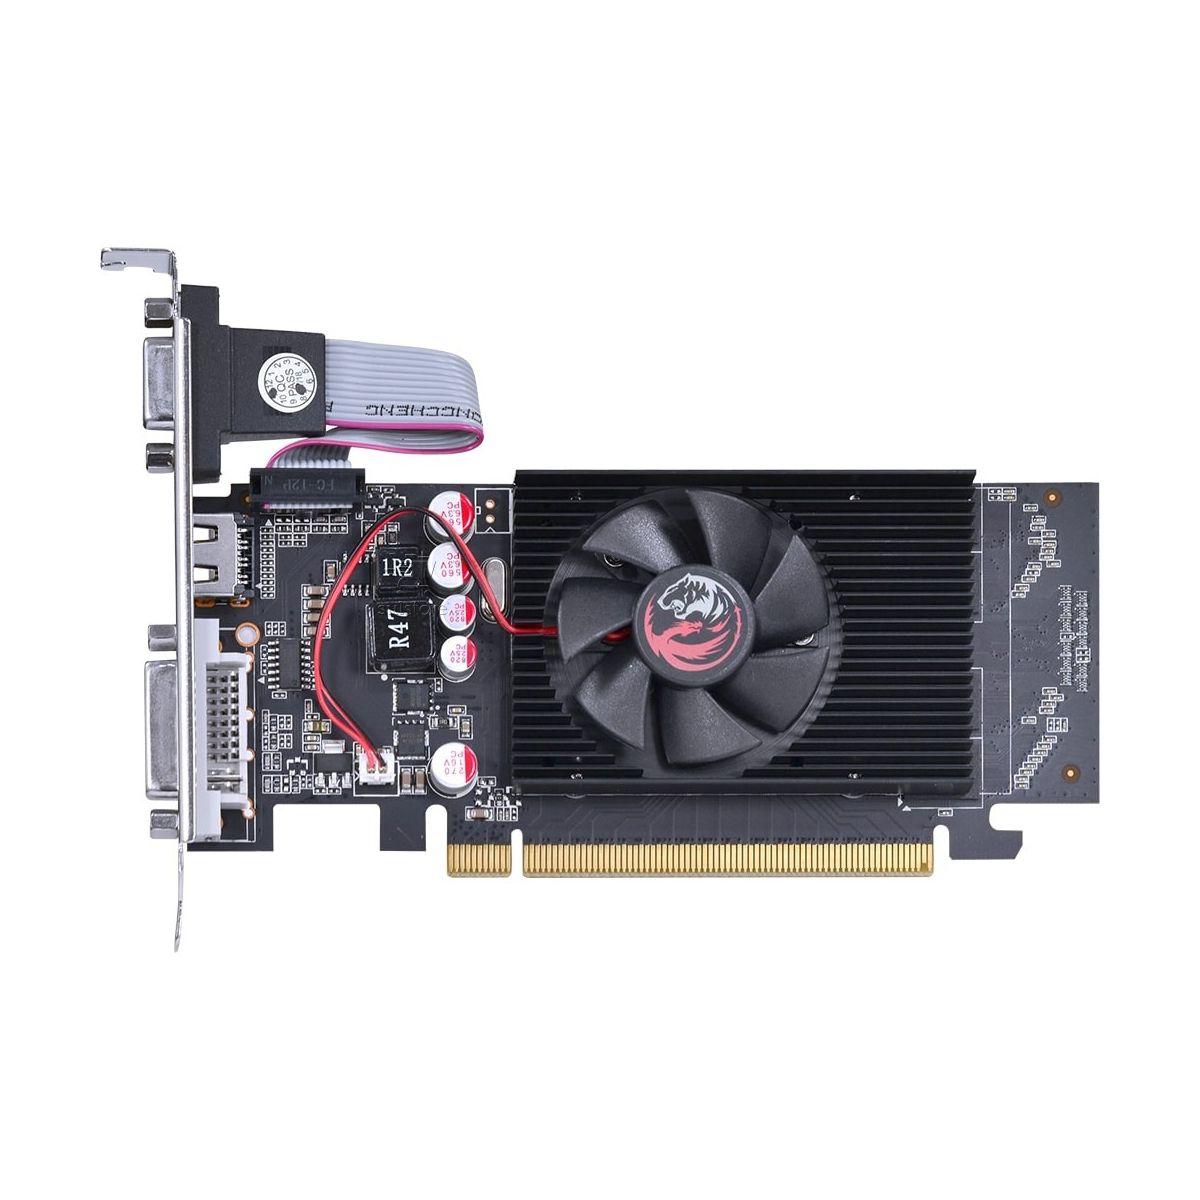 Placa de Vídeo GeForce GT 210 PCYES 1GB DDR2 64 Bits com Low Profile